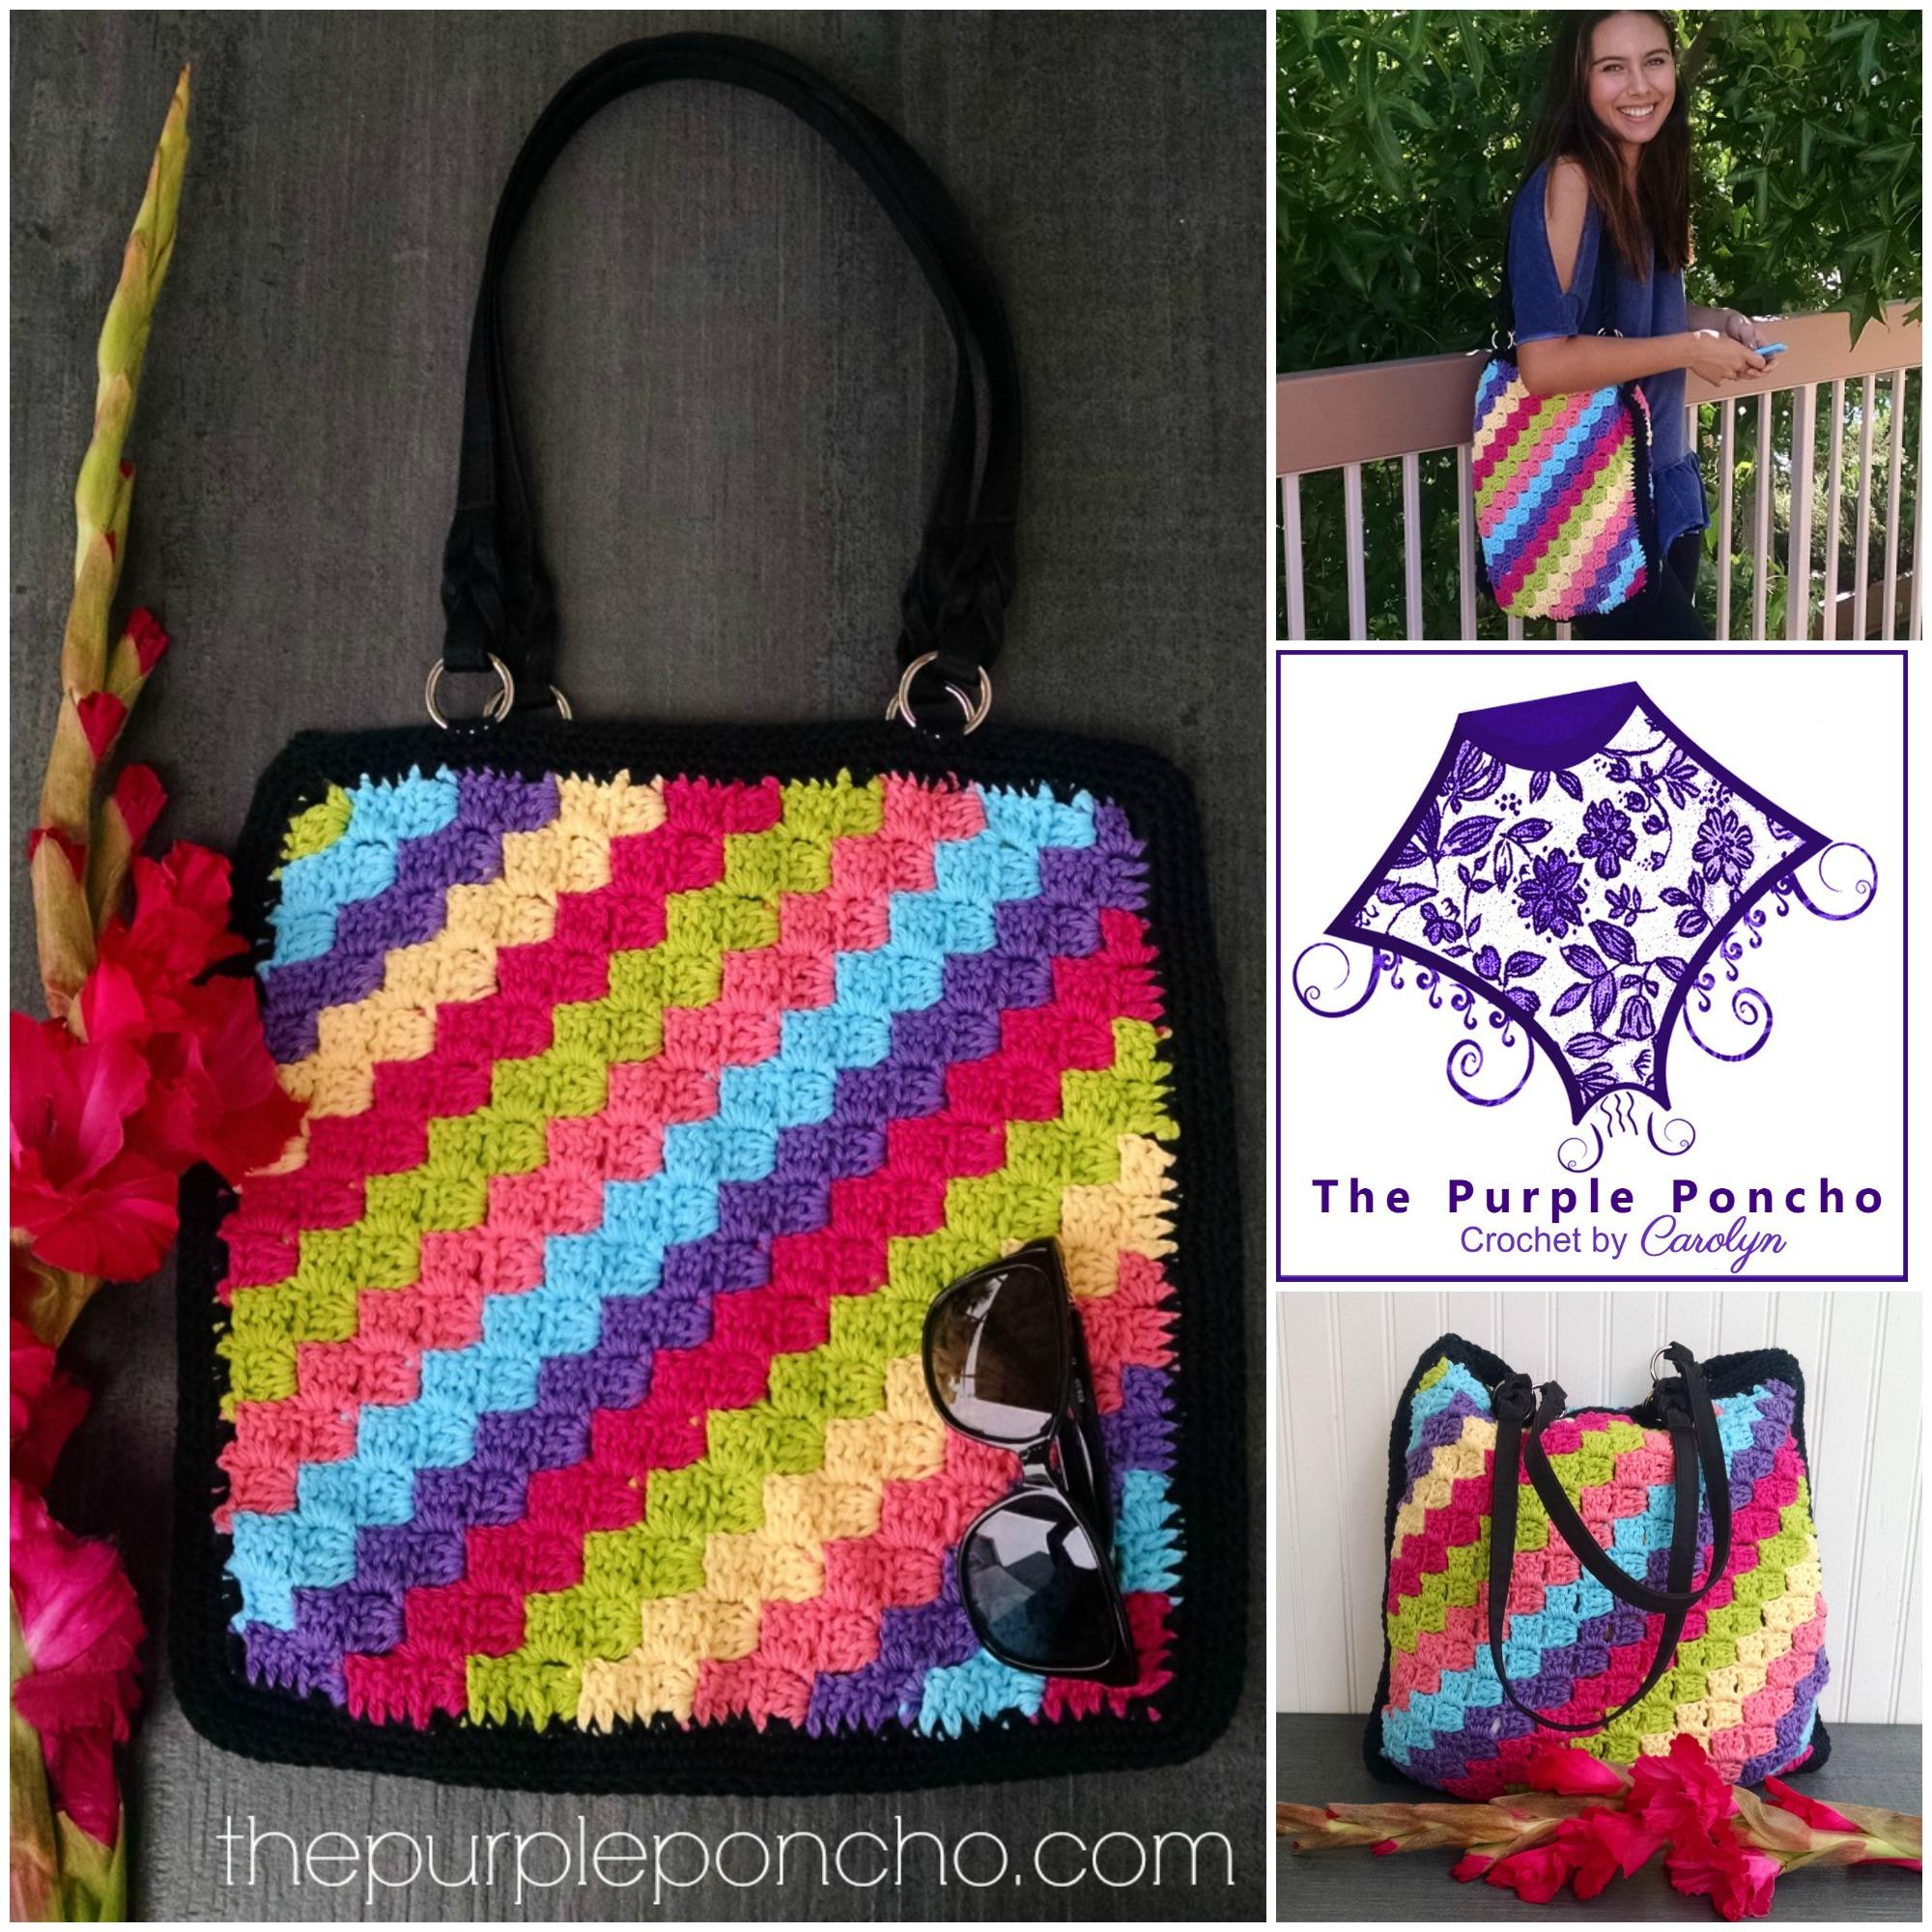 C2C Tote Bag Crochet Design by Carolyn Calderon